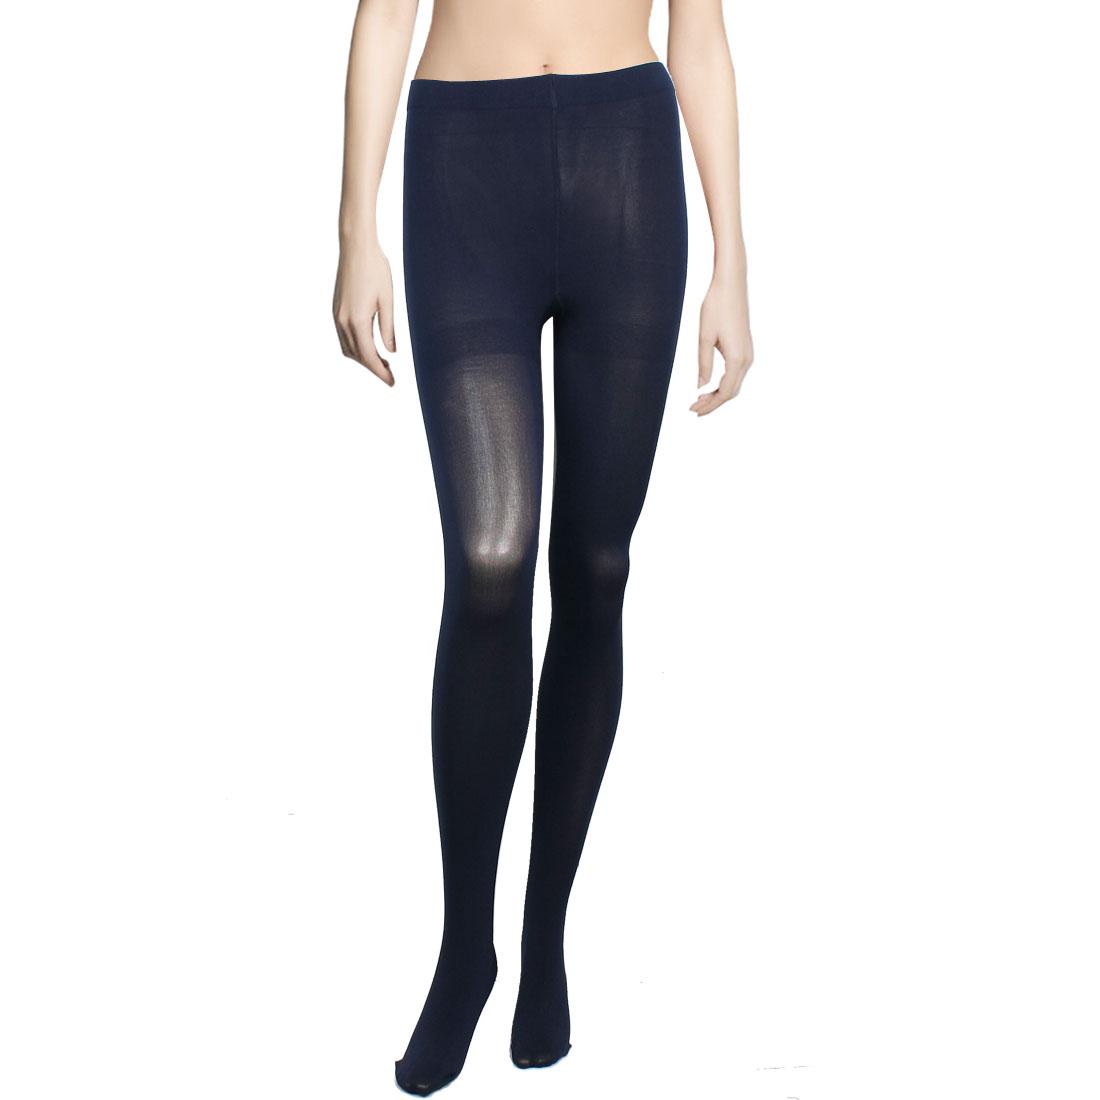 Woman Elastic Waist Closefitting Pantyhose Leggings Navy Blue XS